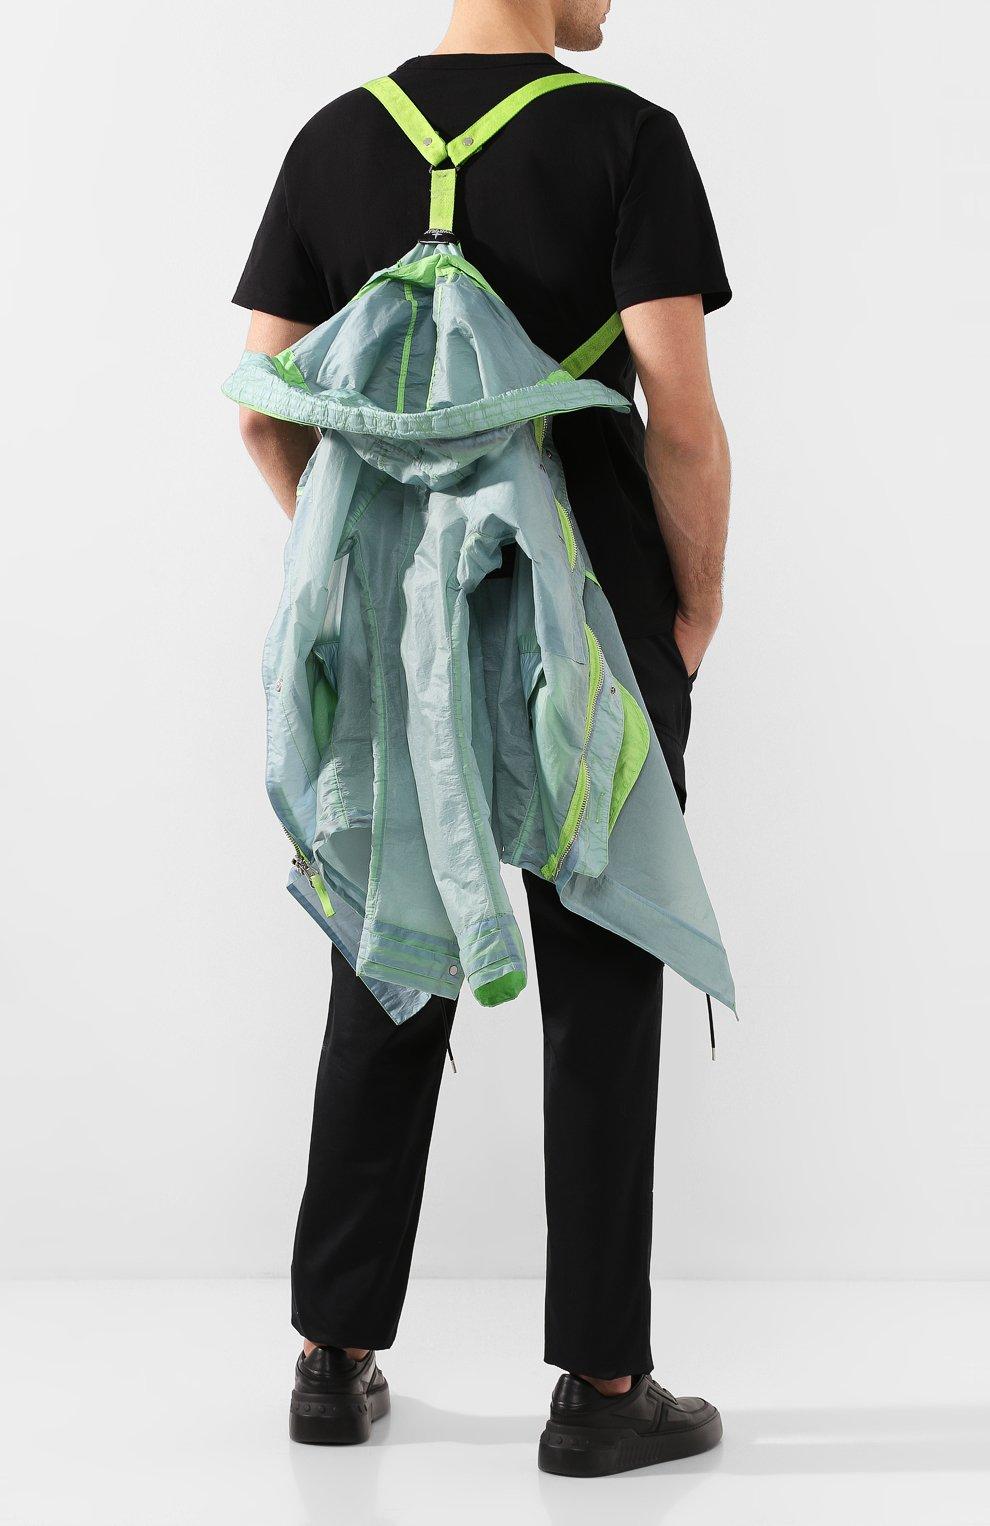 Мужской плащ STONE ISLAND SHADOW PROJECT светло-зеленого цвета, арт. 721970105 | Фото 6